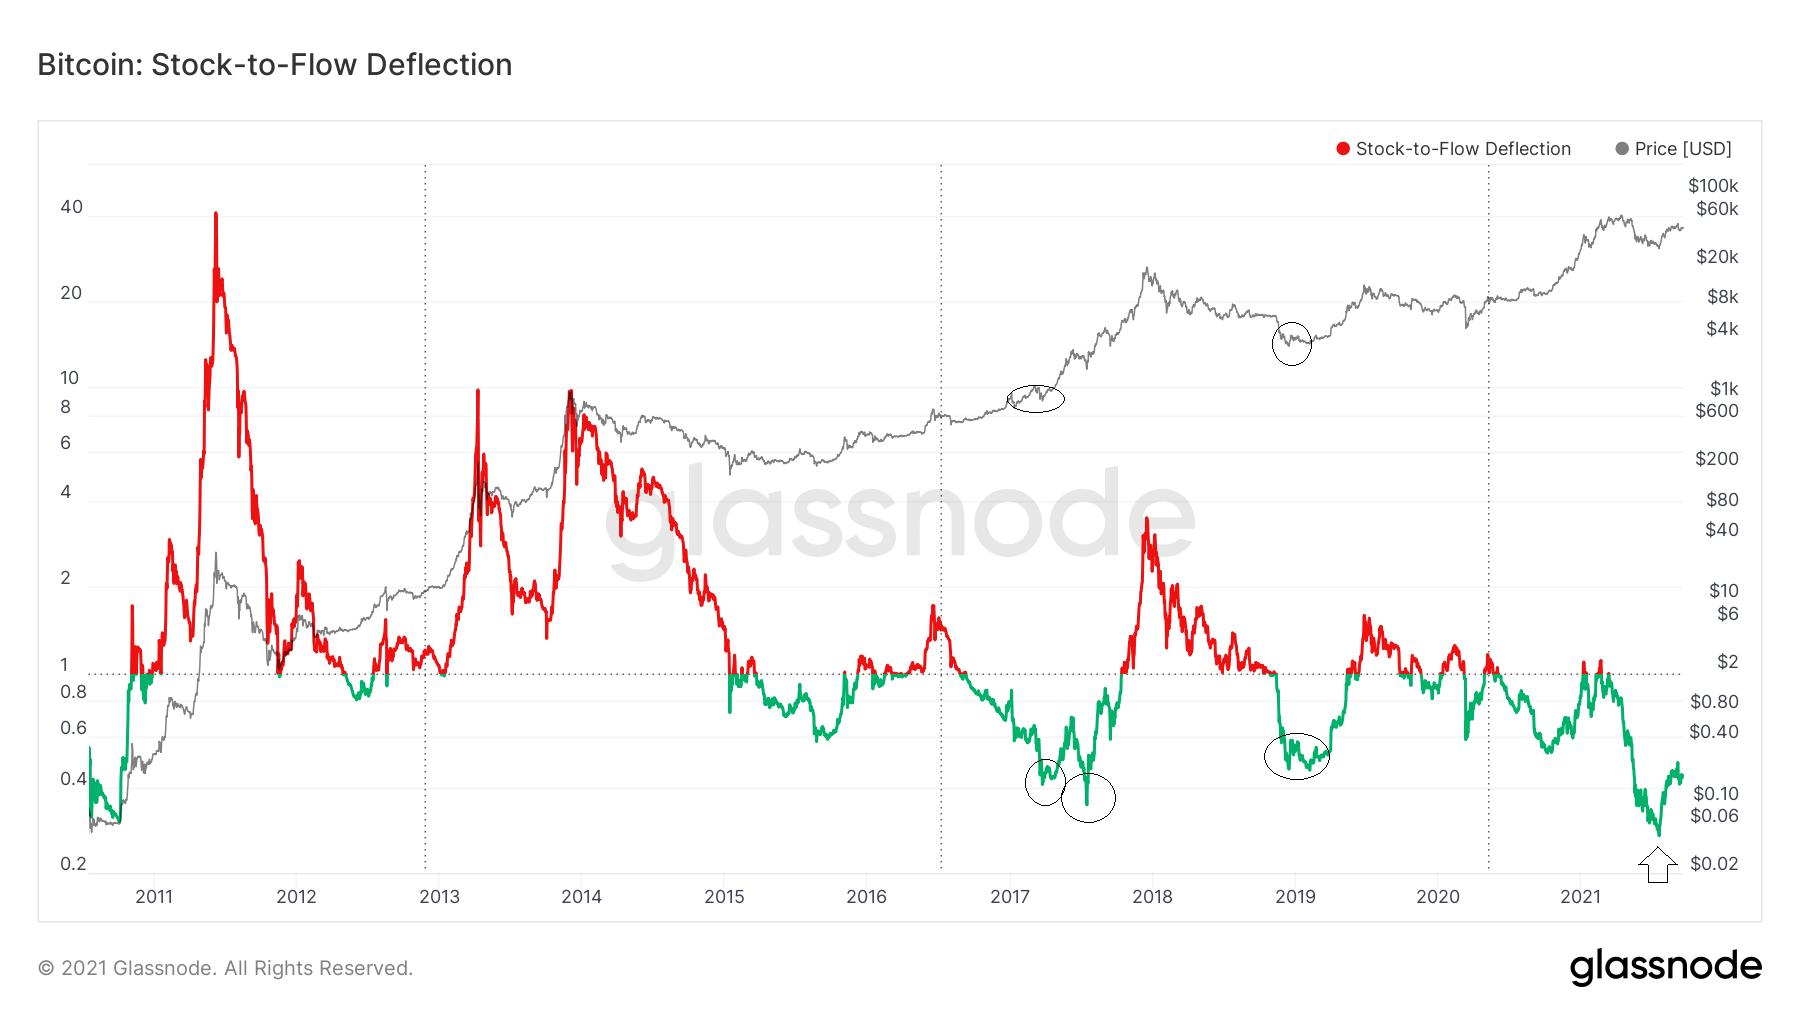 Bitcoin Stock to Floe Deflection Chart